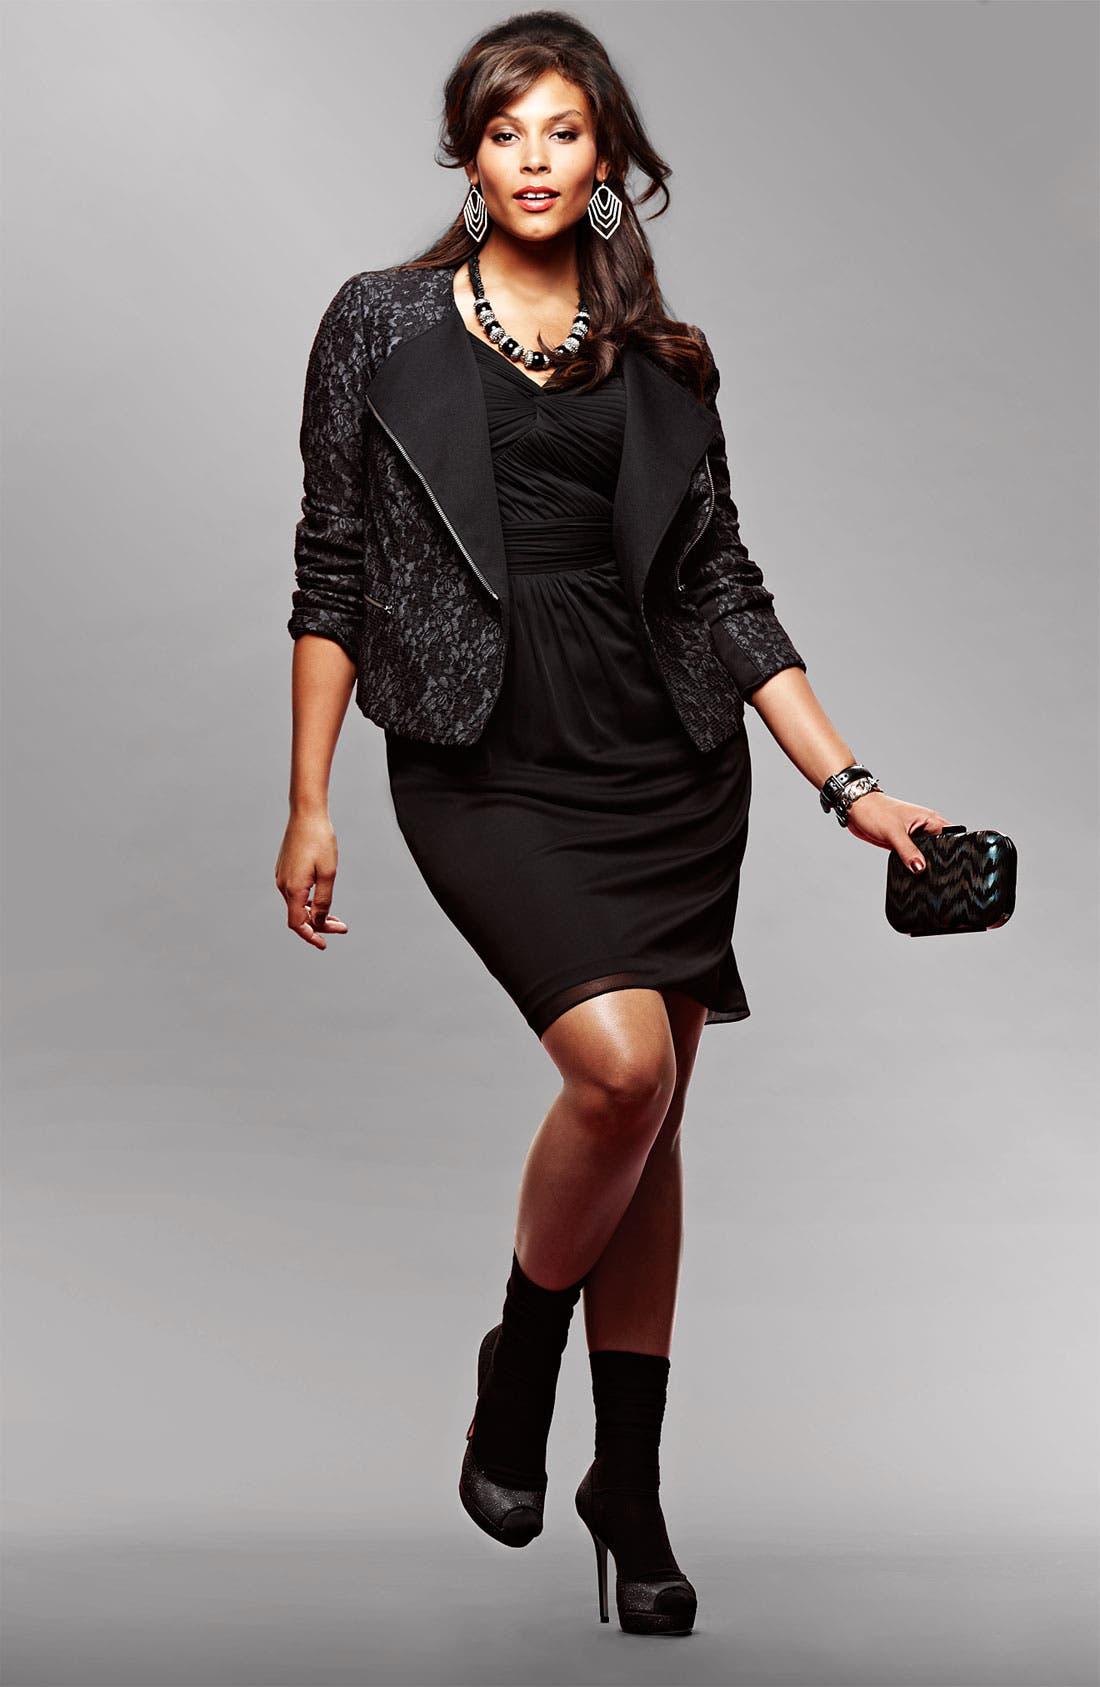 Alternate Image 1 Selected - Adrianna Papell Dress & DKNYC Jacket